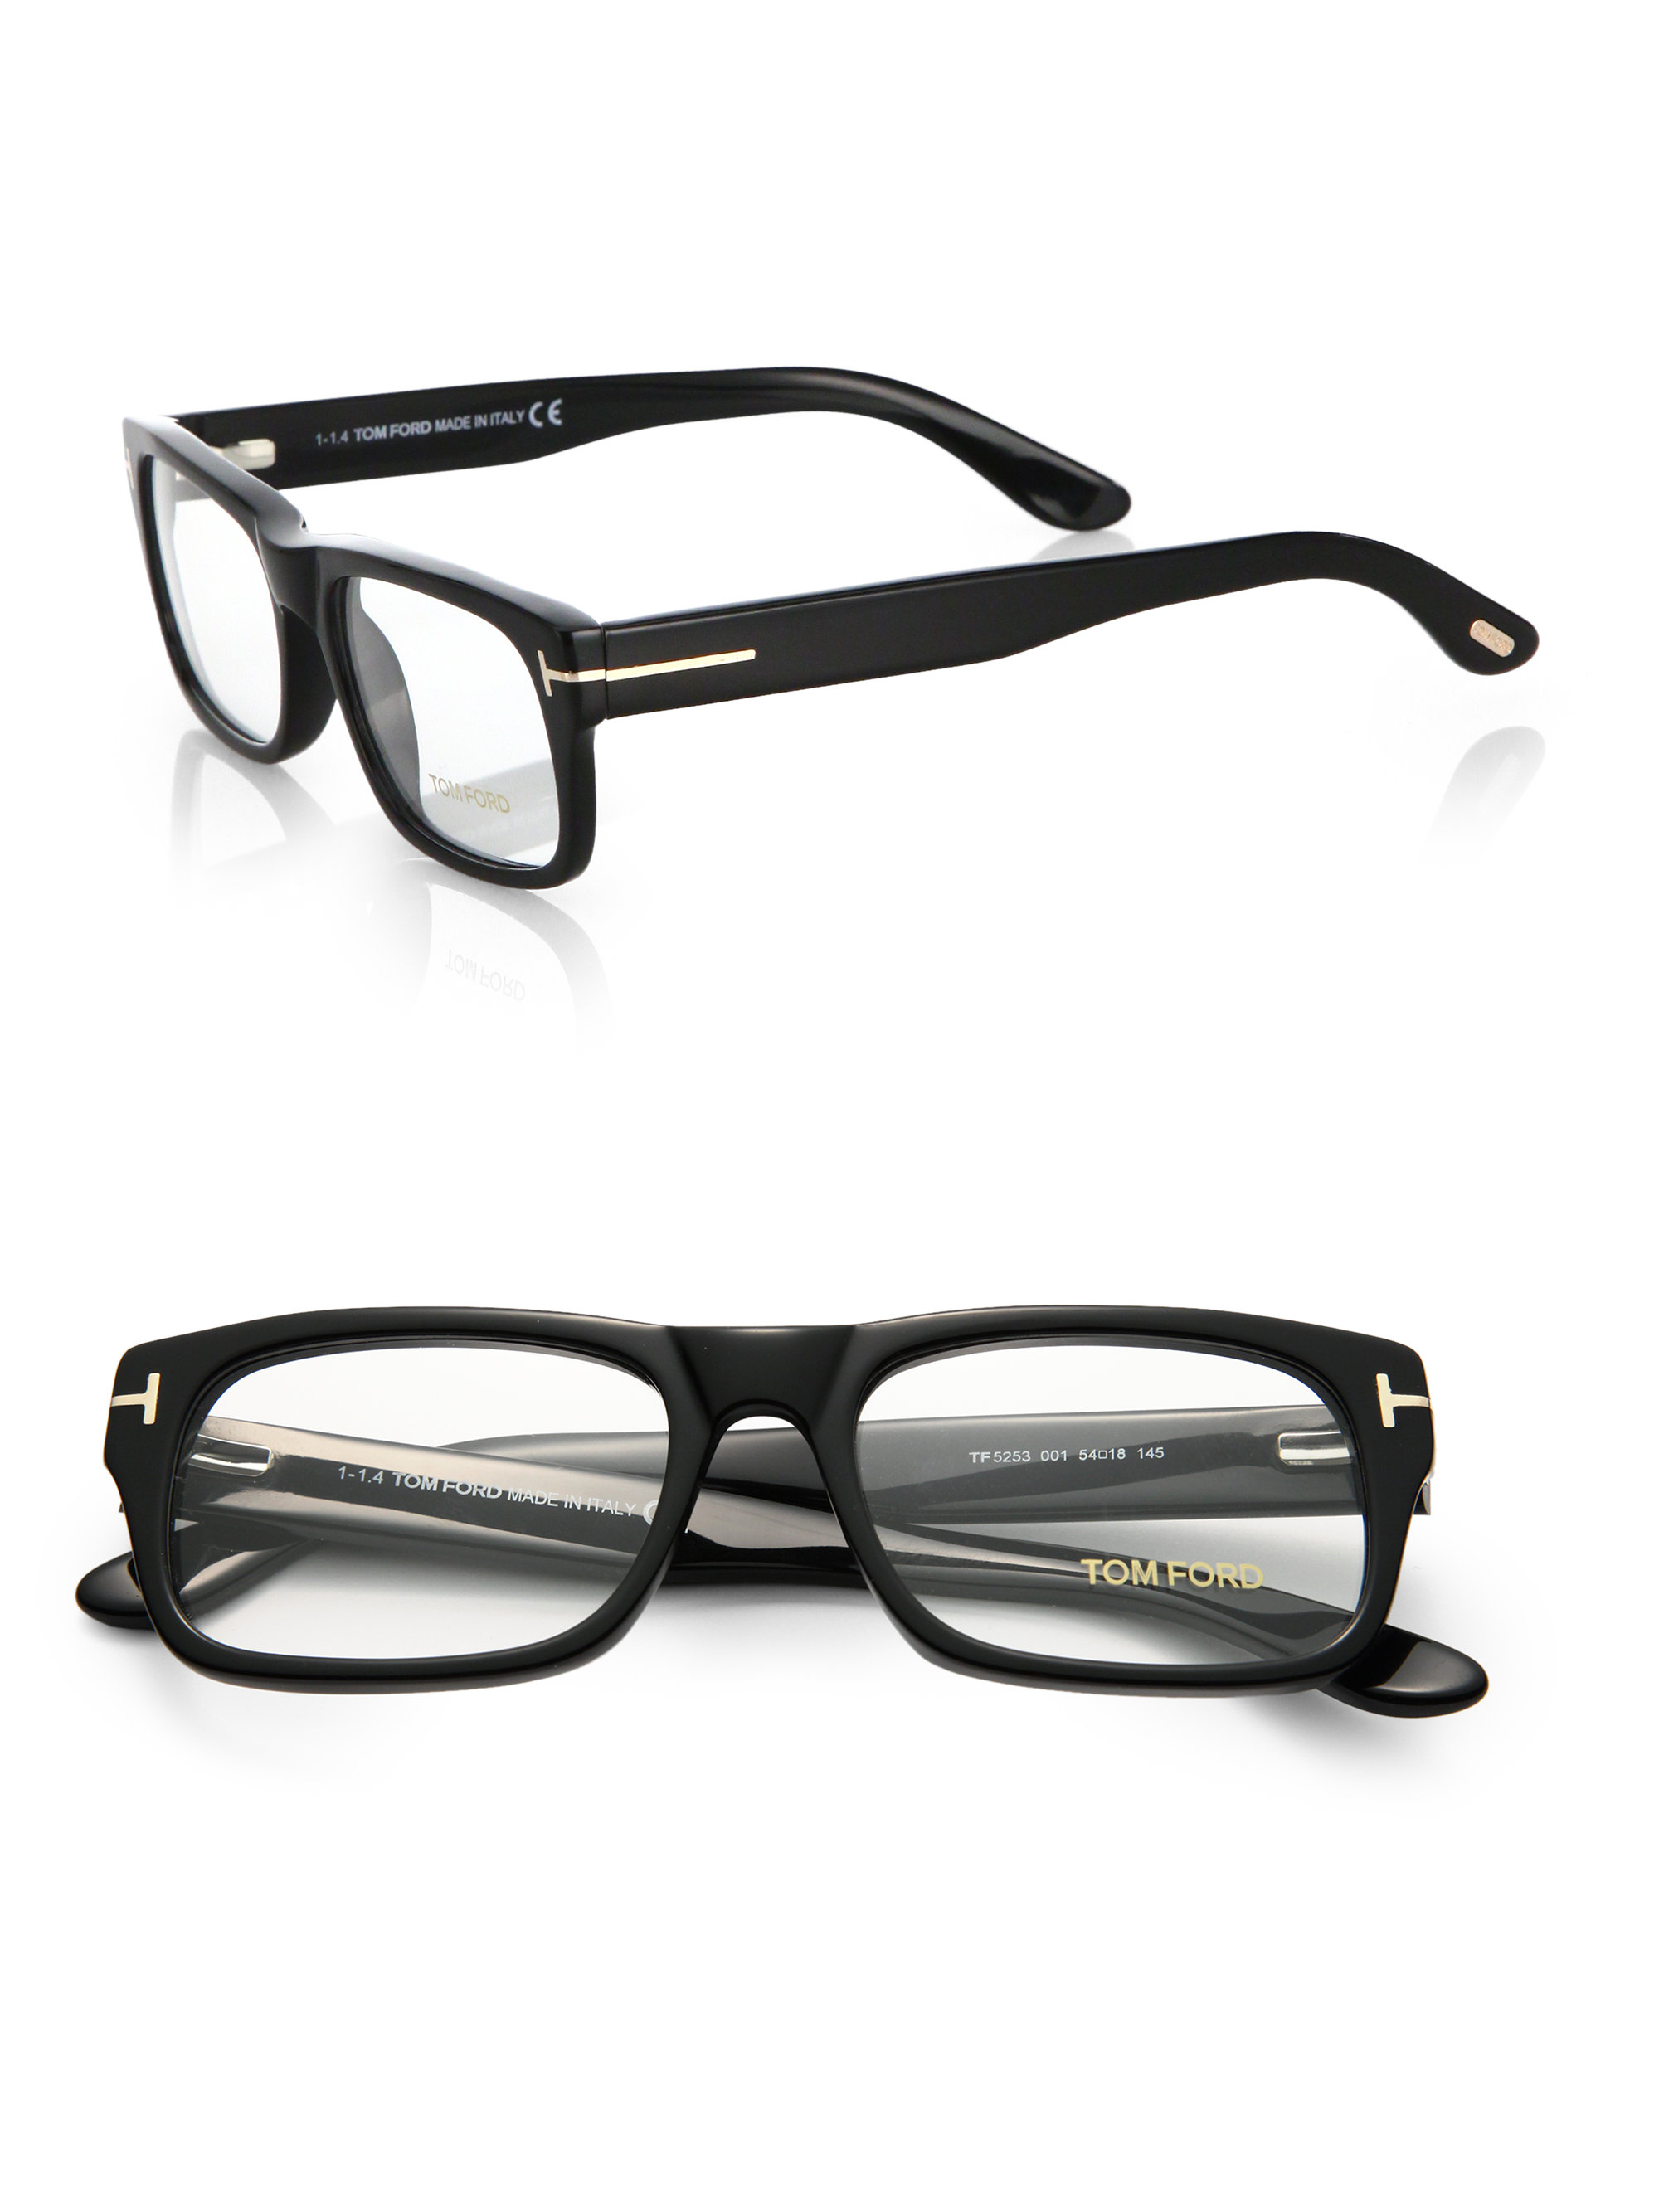 Lyst - Tom Ford 5253 Bold Optical Frames in Black for Men